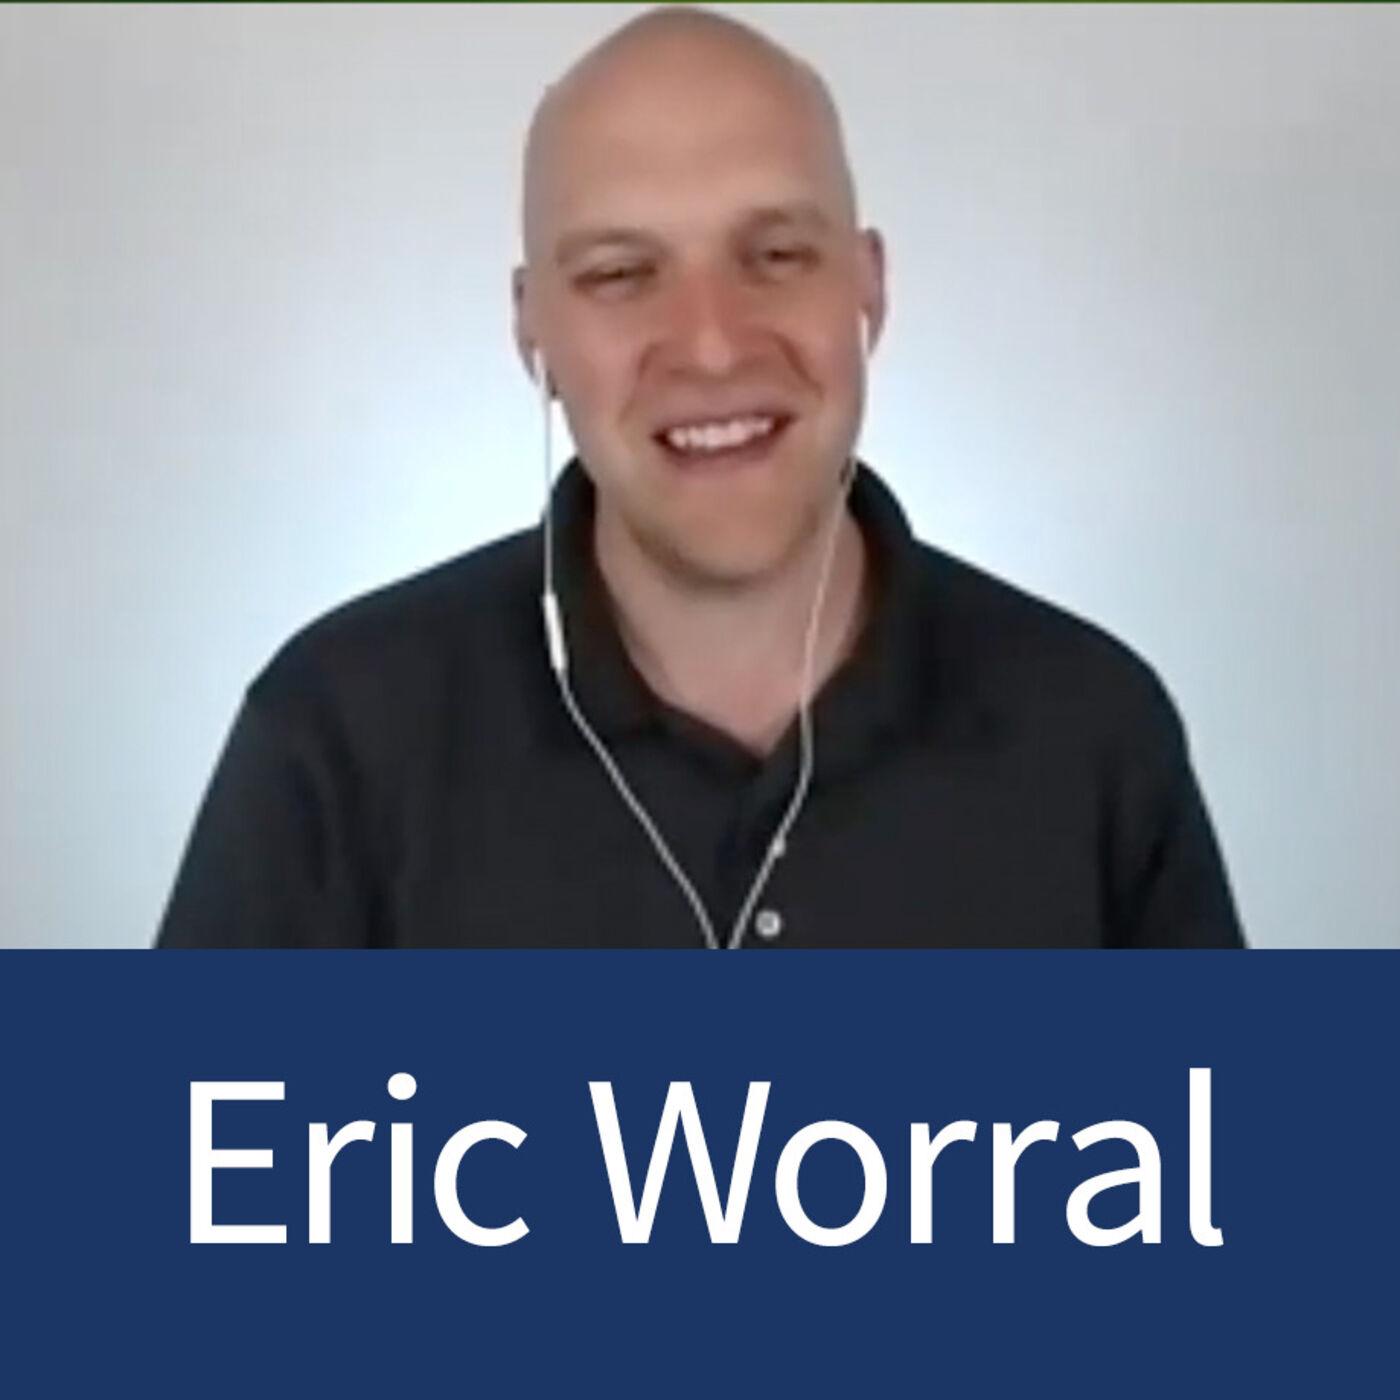 Eric Worral - LoCo Ventures - Gaining Traction Through Organic Views - Episode 20